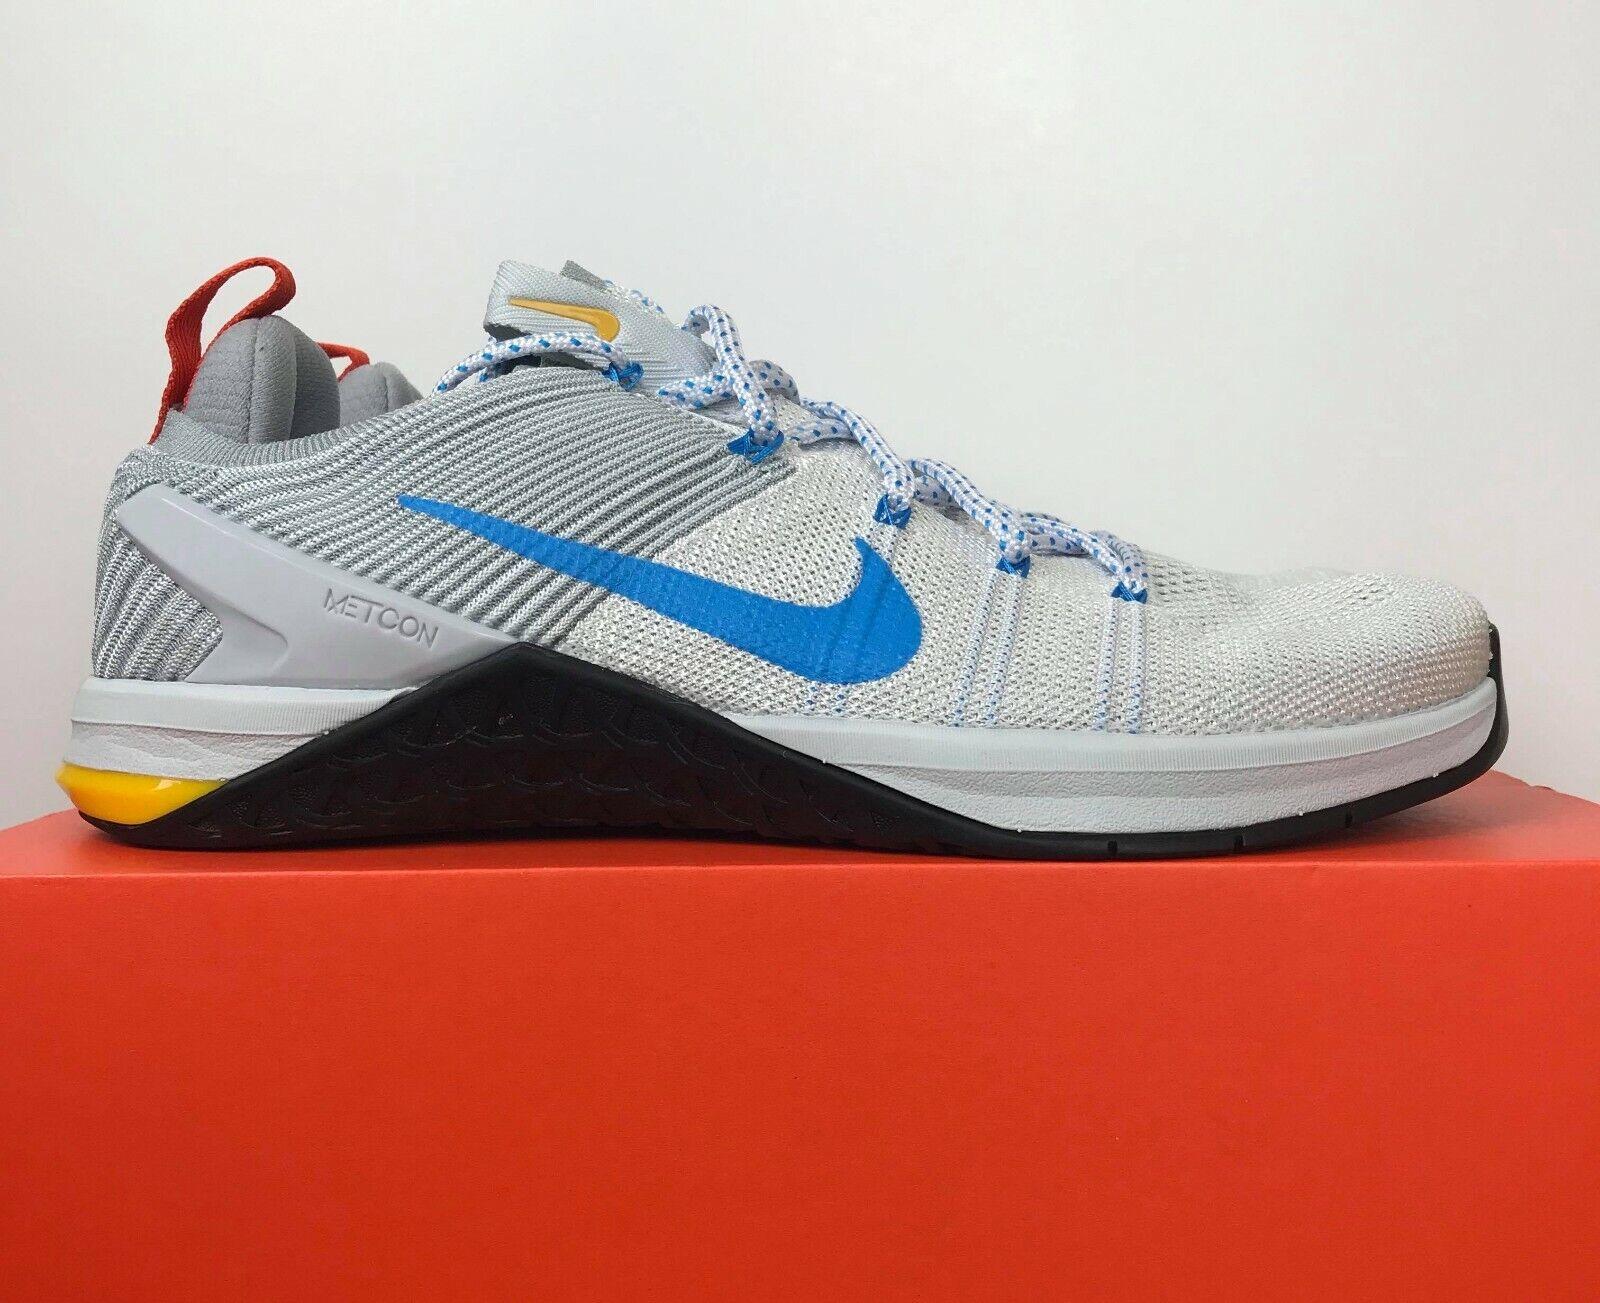 Nike Metcon DSX Flyknit 2 White bluee Platinum 924423-140 Men's Size 11